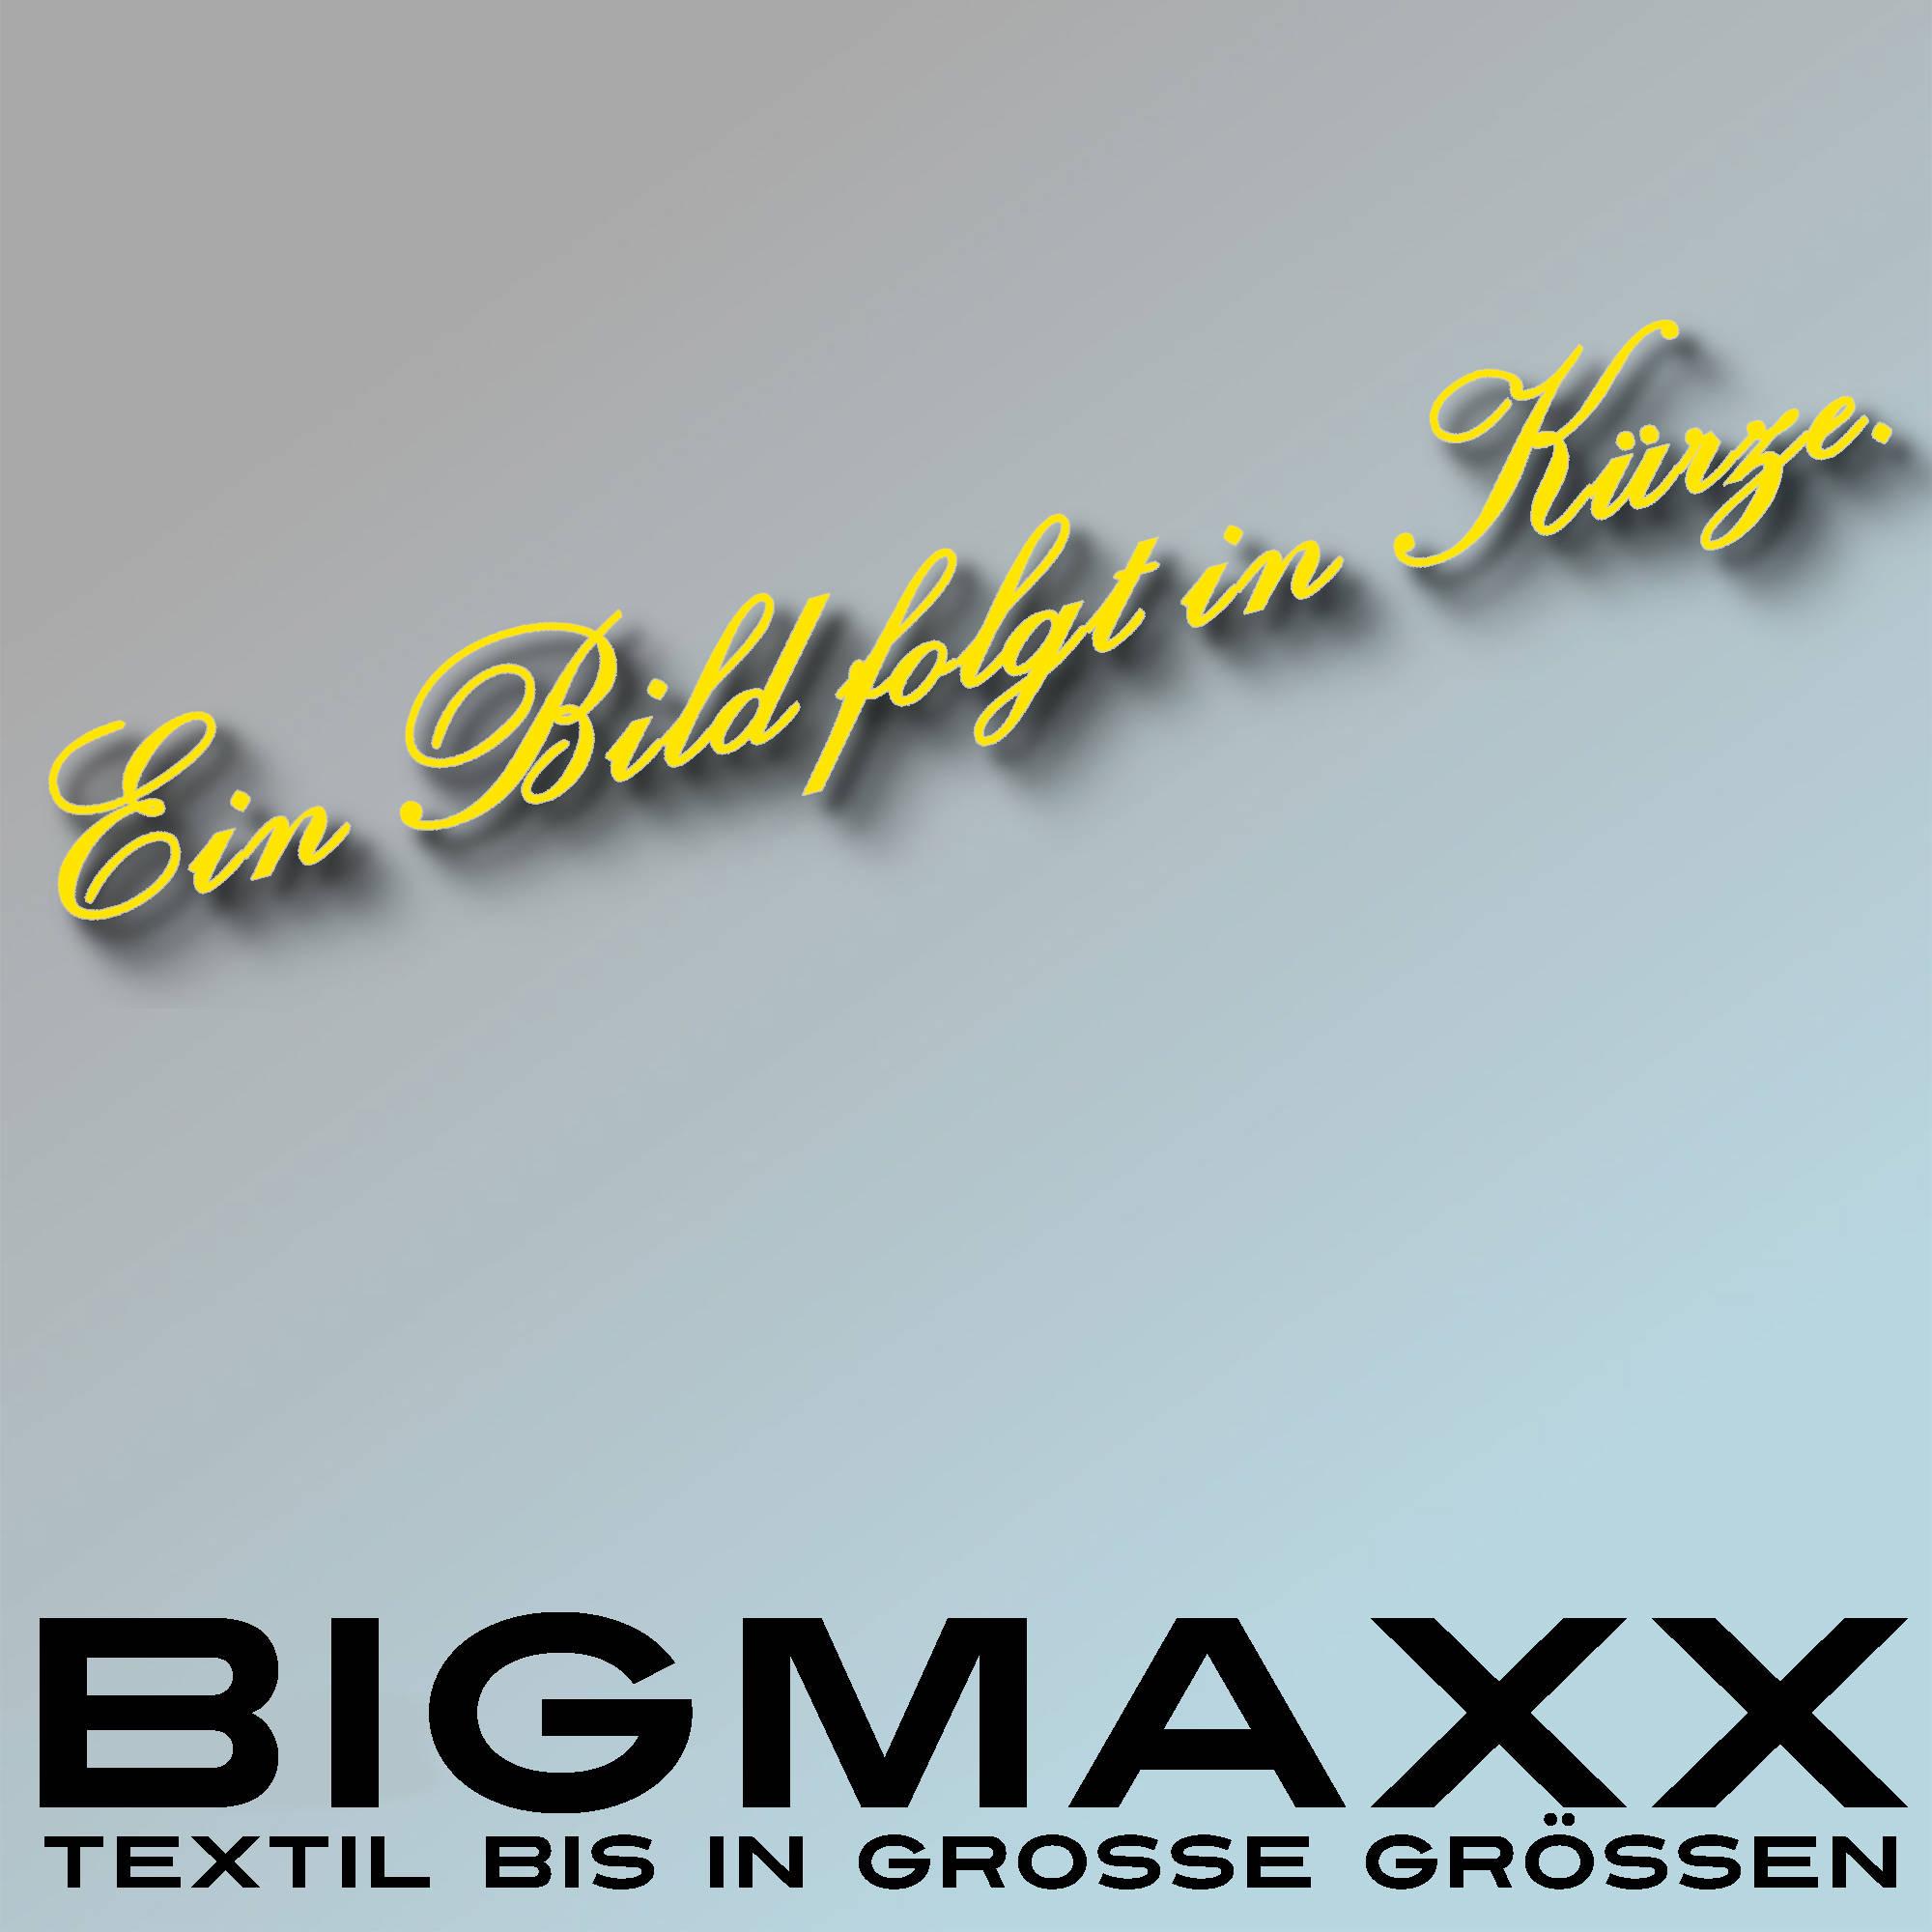 5er Pack weiße Herrenunterhemden Ripunterhemd Unterhemd Bellaripp Netzhemd